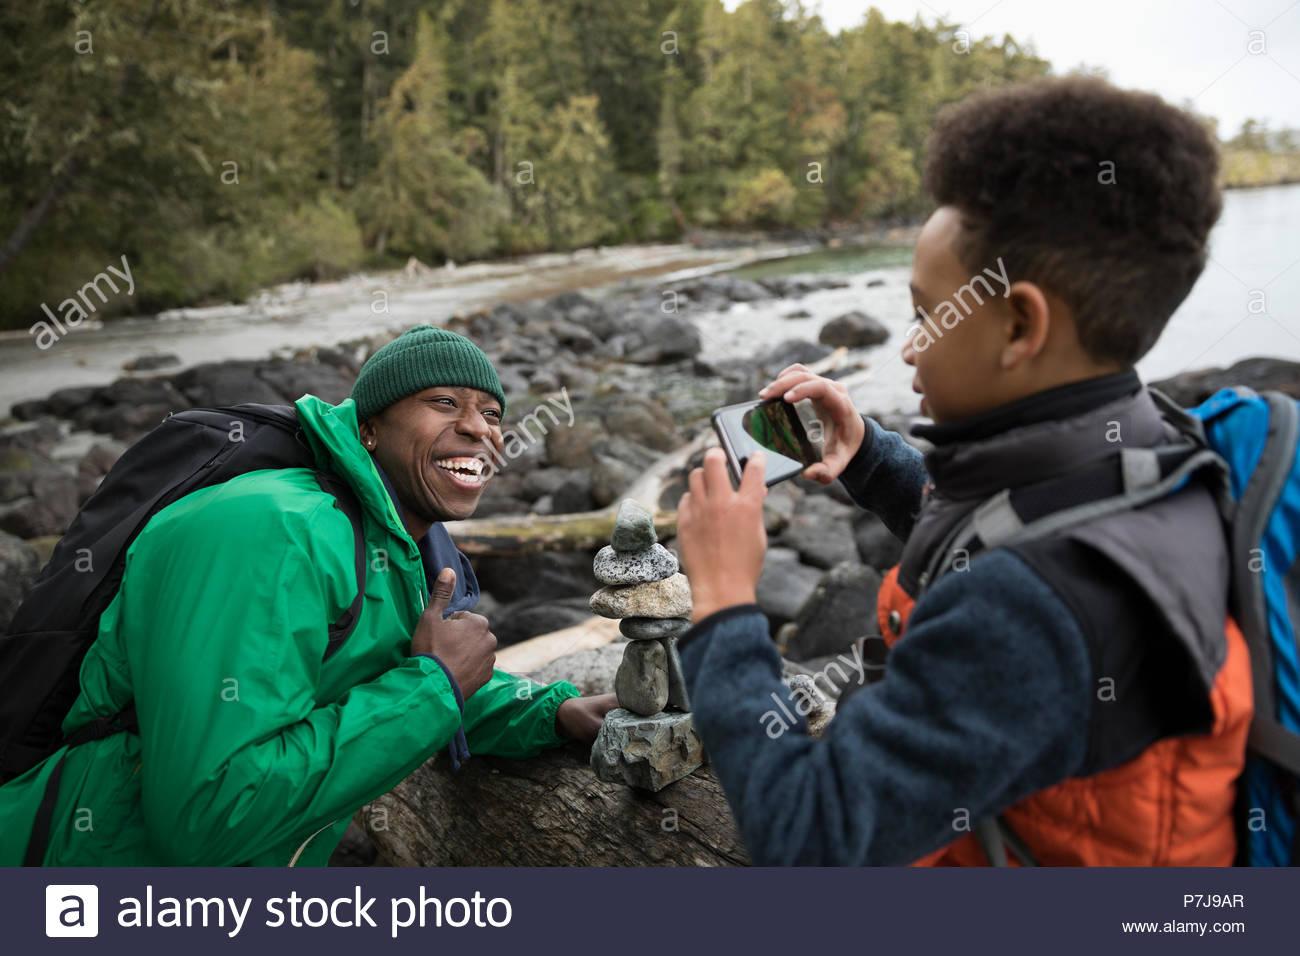 Sohn mit Kamera Handy fotografieren verspielt Vater auf robusten Strand Stockbild